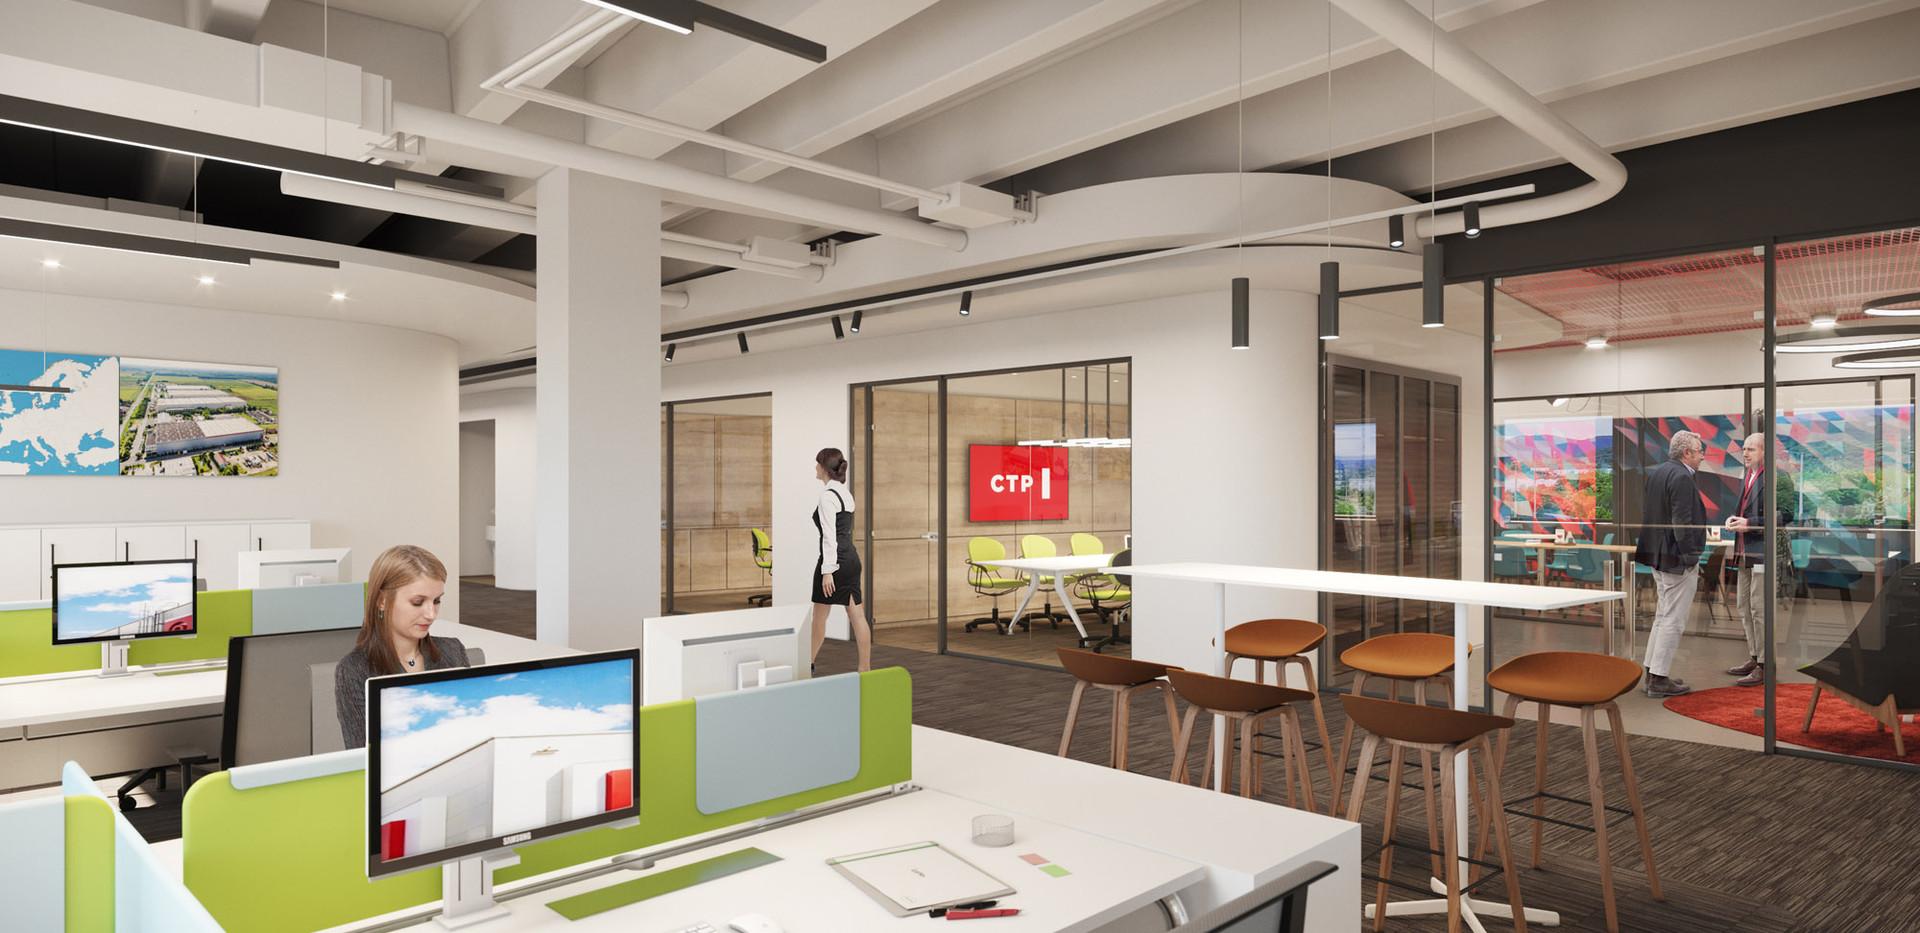 070-CTP-Iroda-office-Demeter-Design-Stud